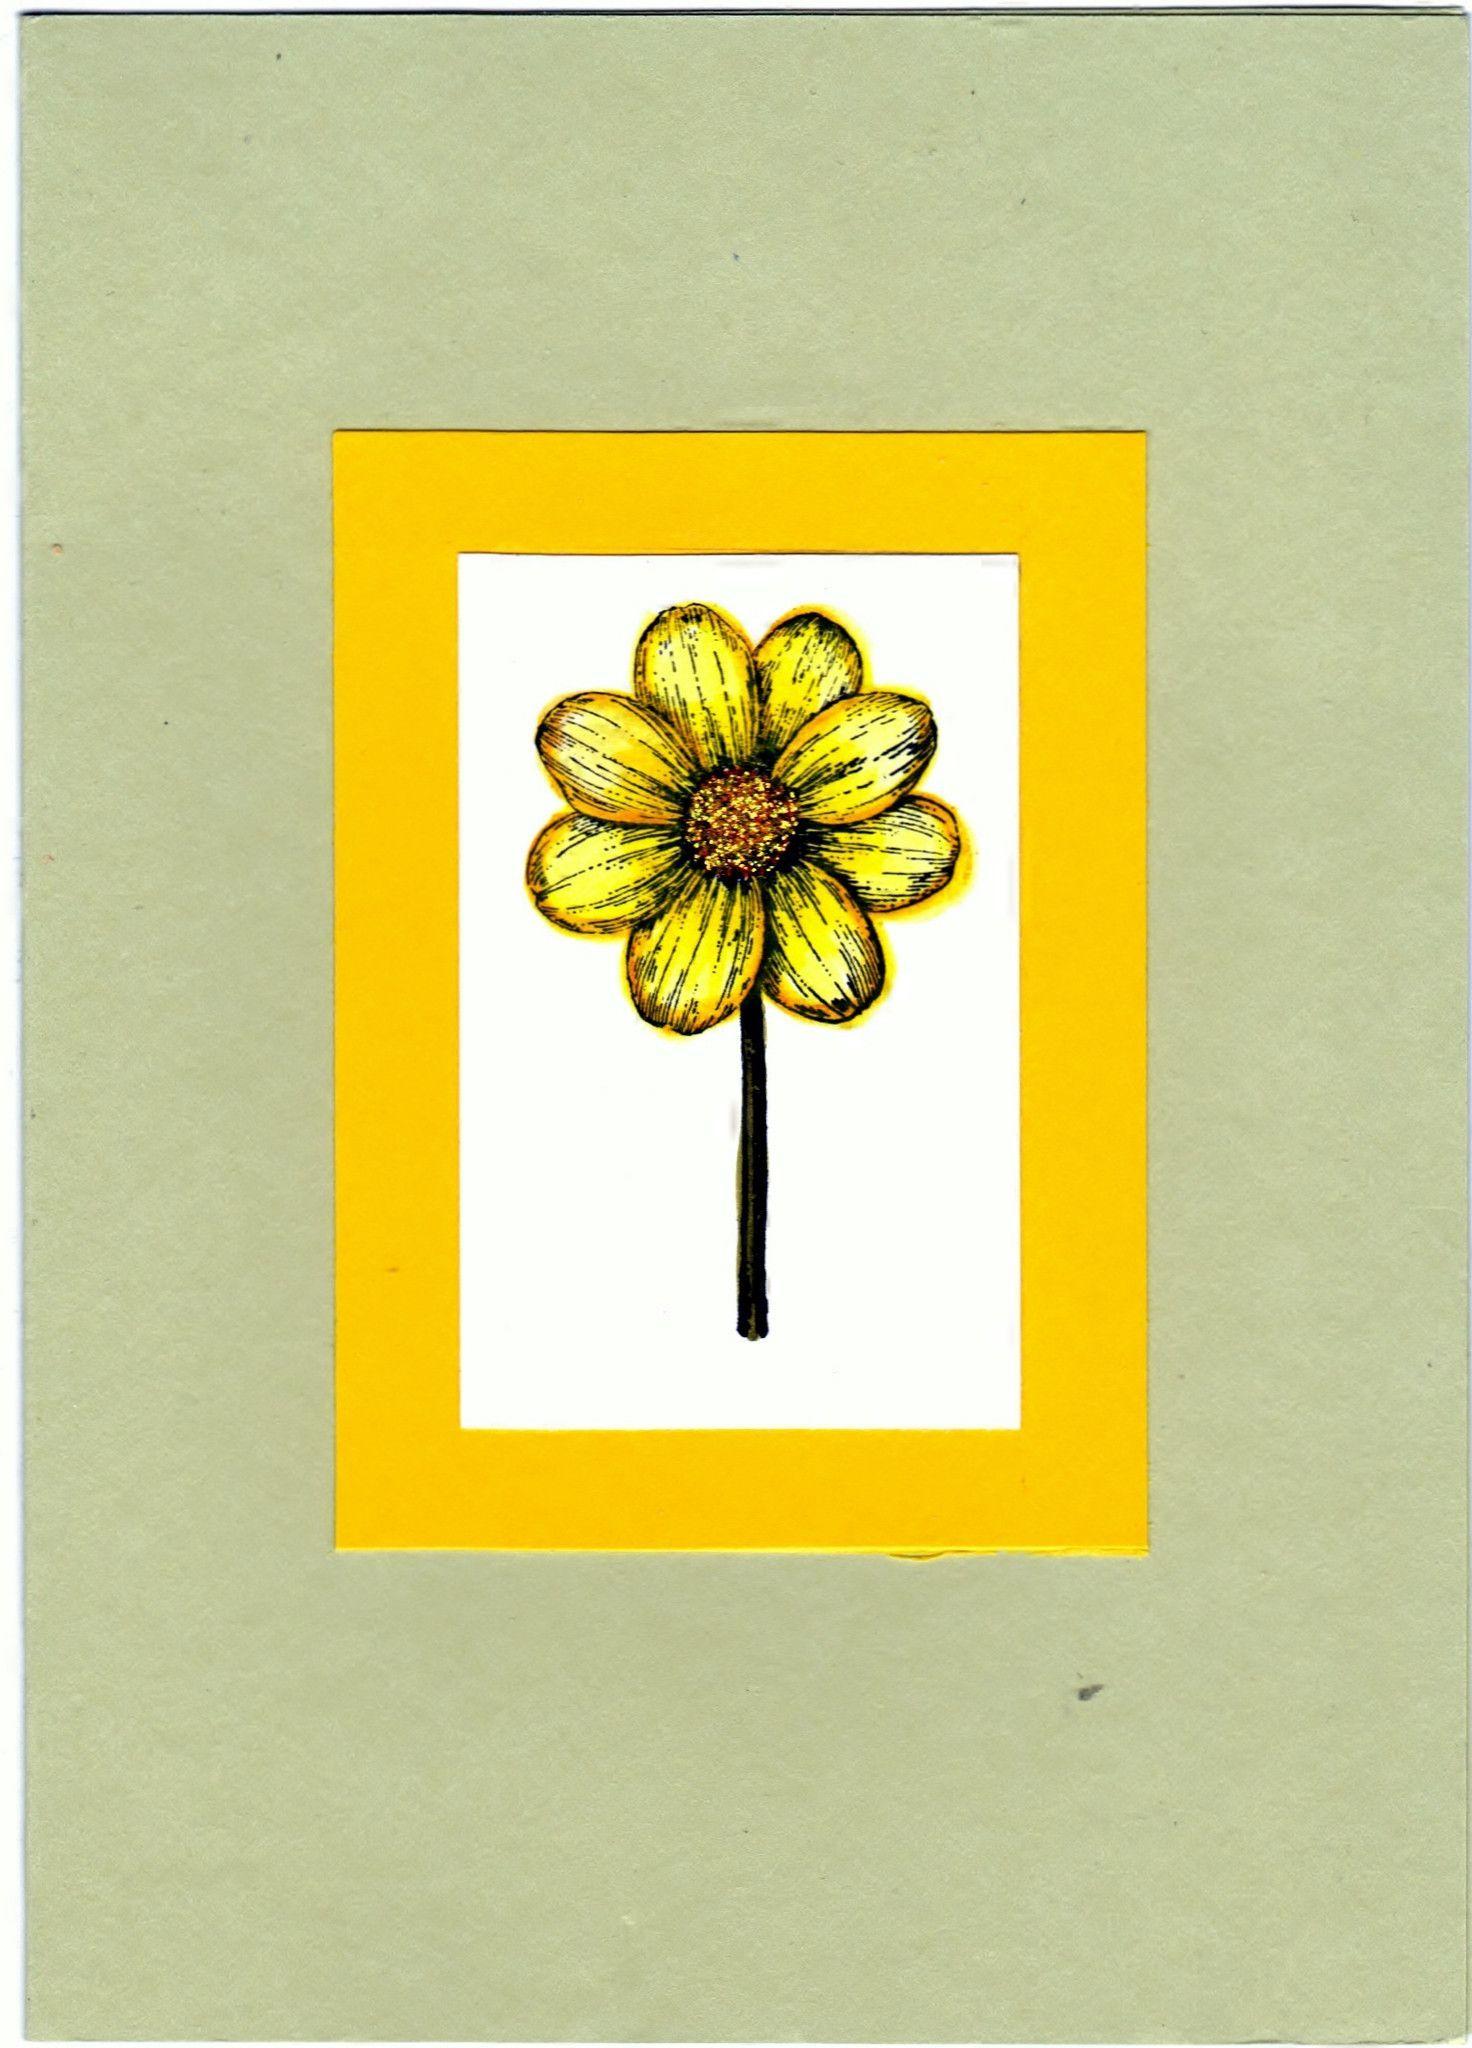 Sunflower inked handmade good greeting supply card clearance